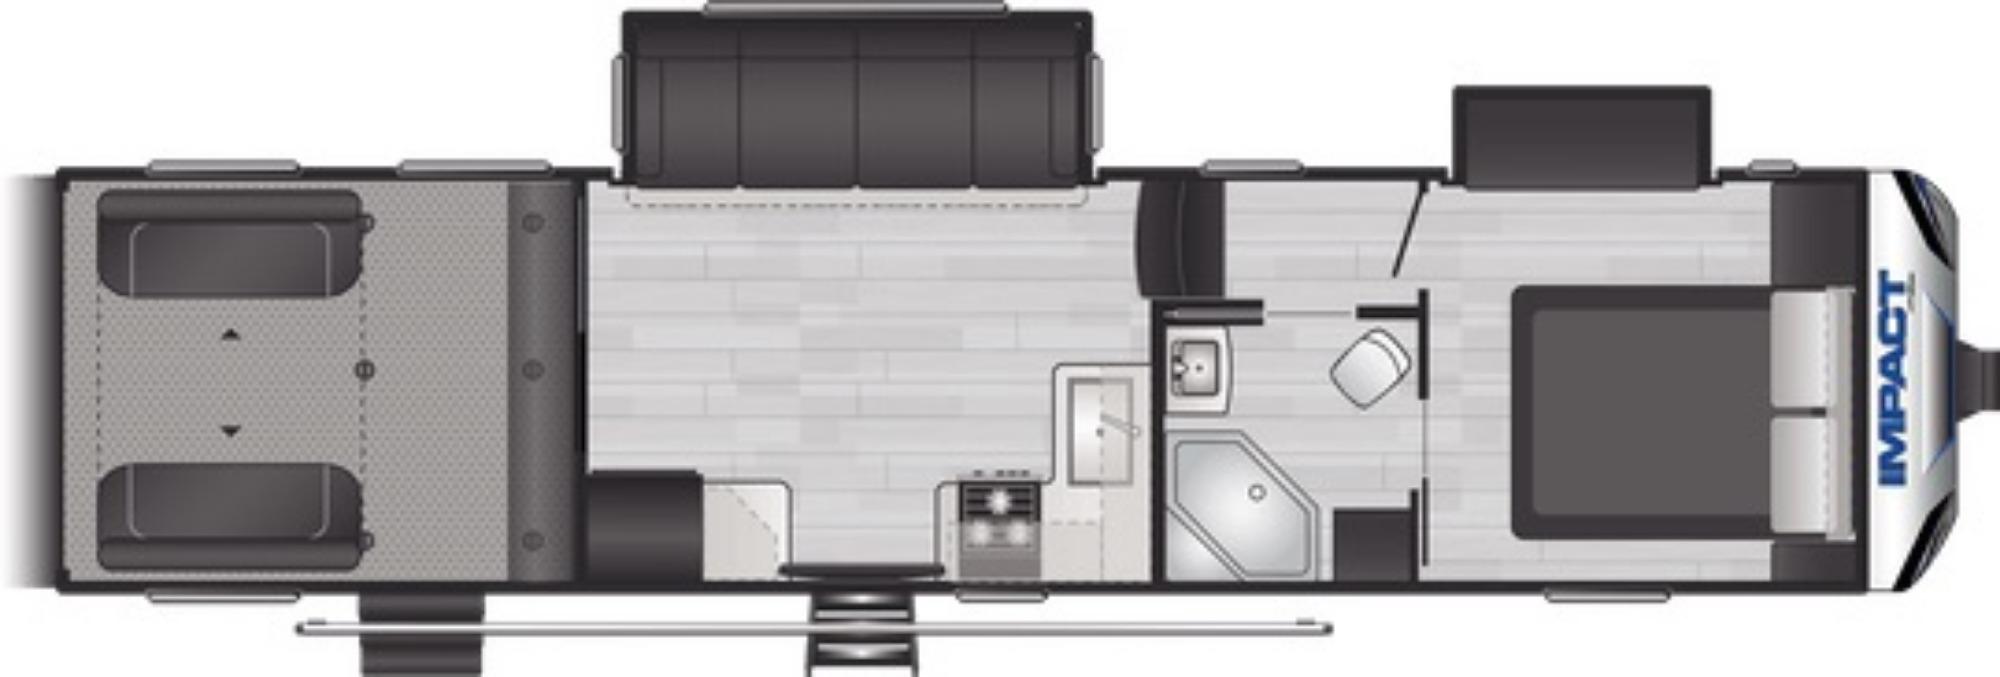 View Floor Plan for 2021 KEYSTONE IMPACT 311